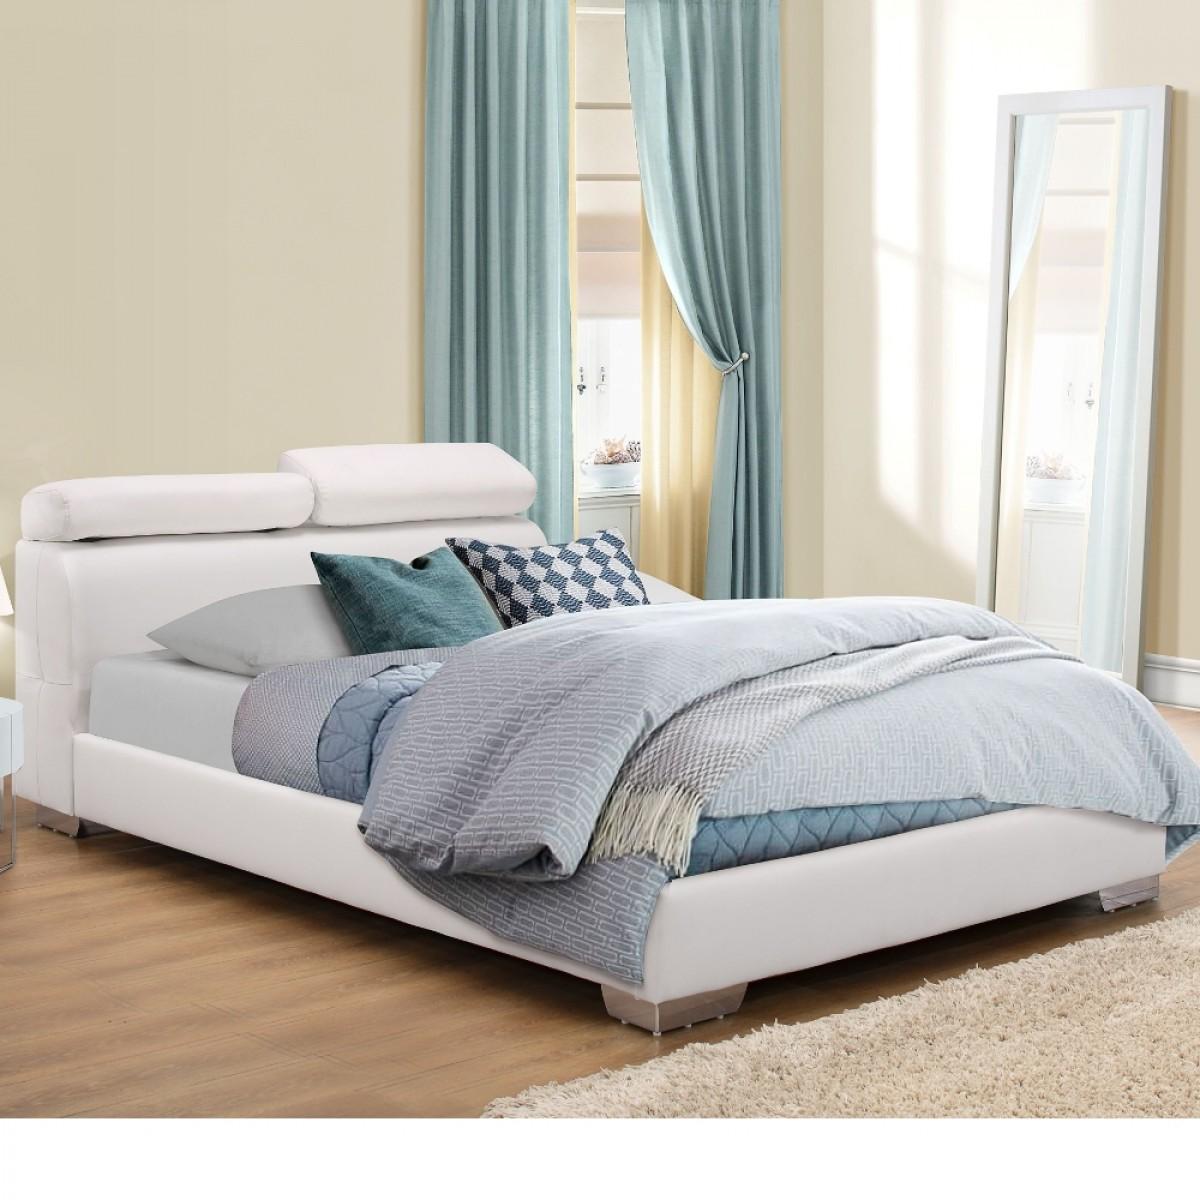 Signature White Leather Bed Adjustable Headboard